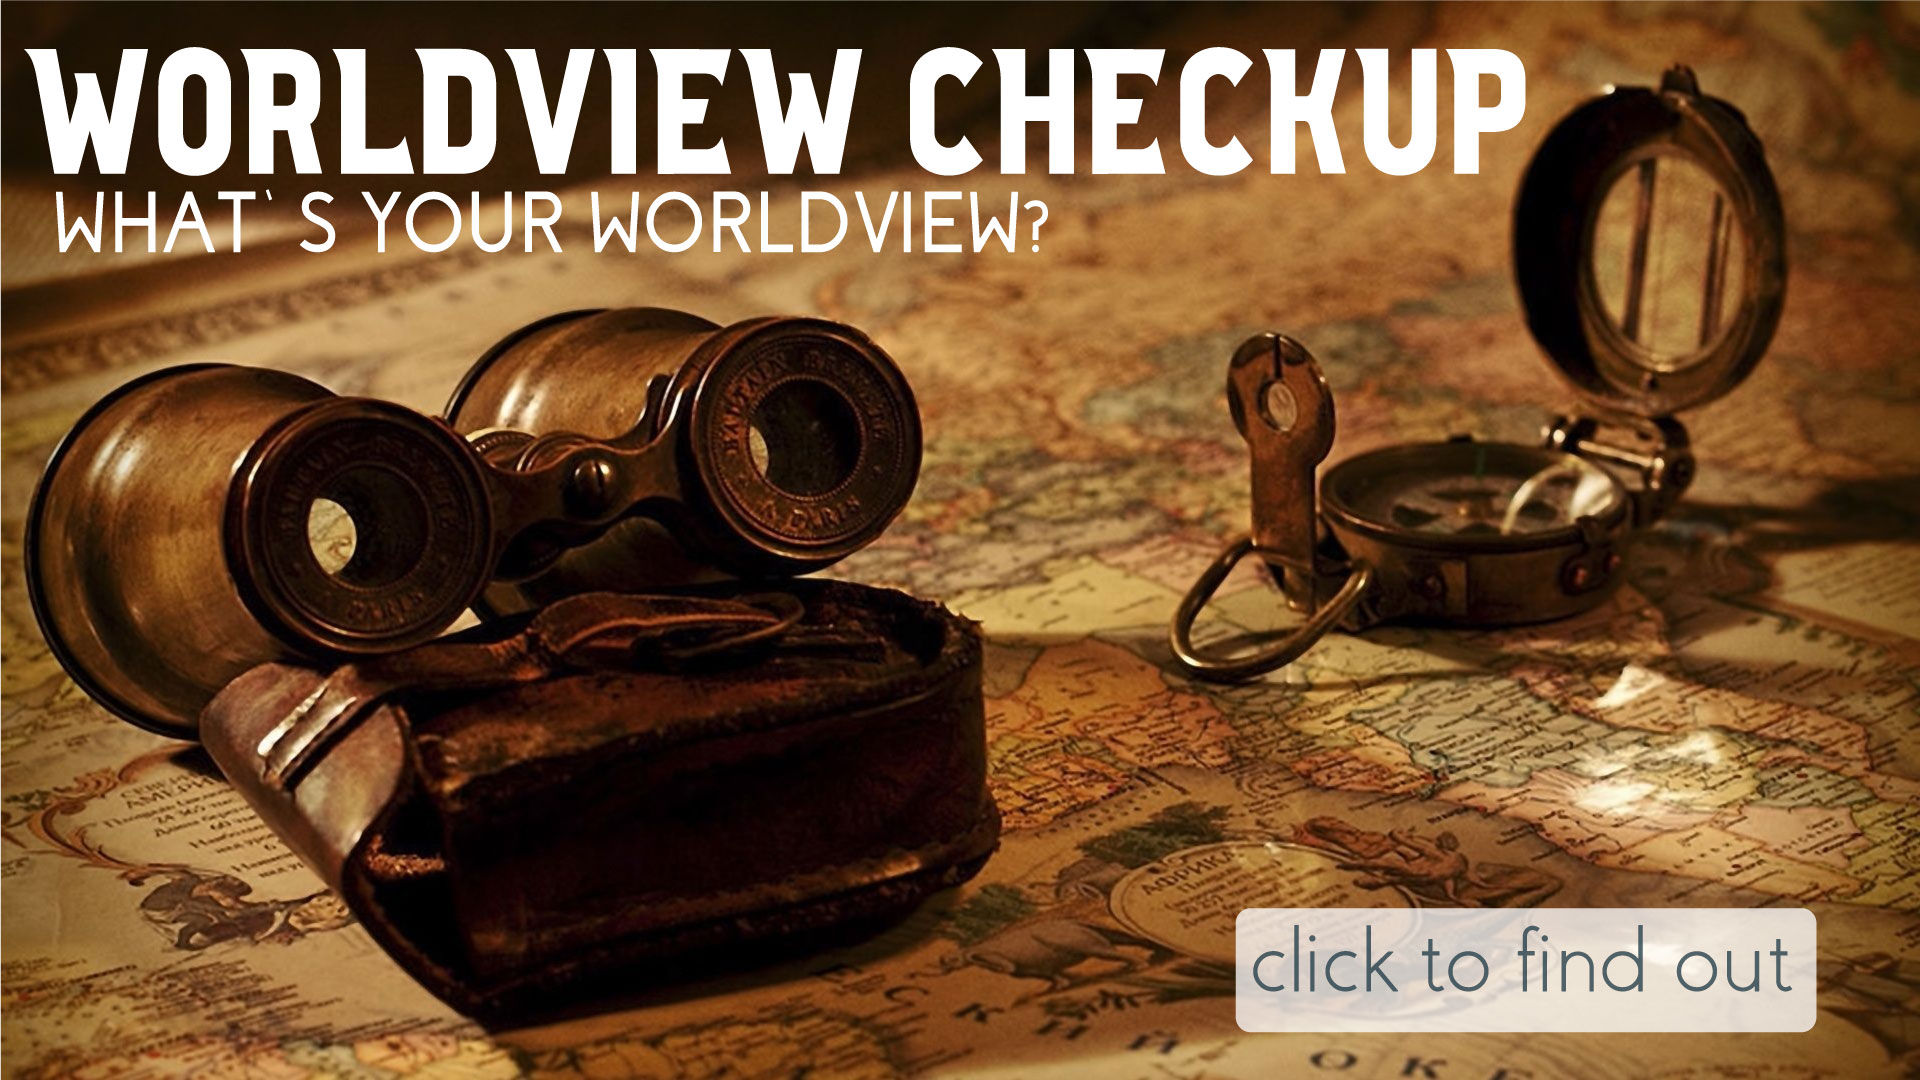 Worldview-Checkup-Banner.jpg